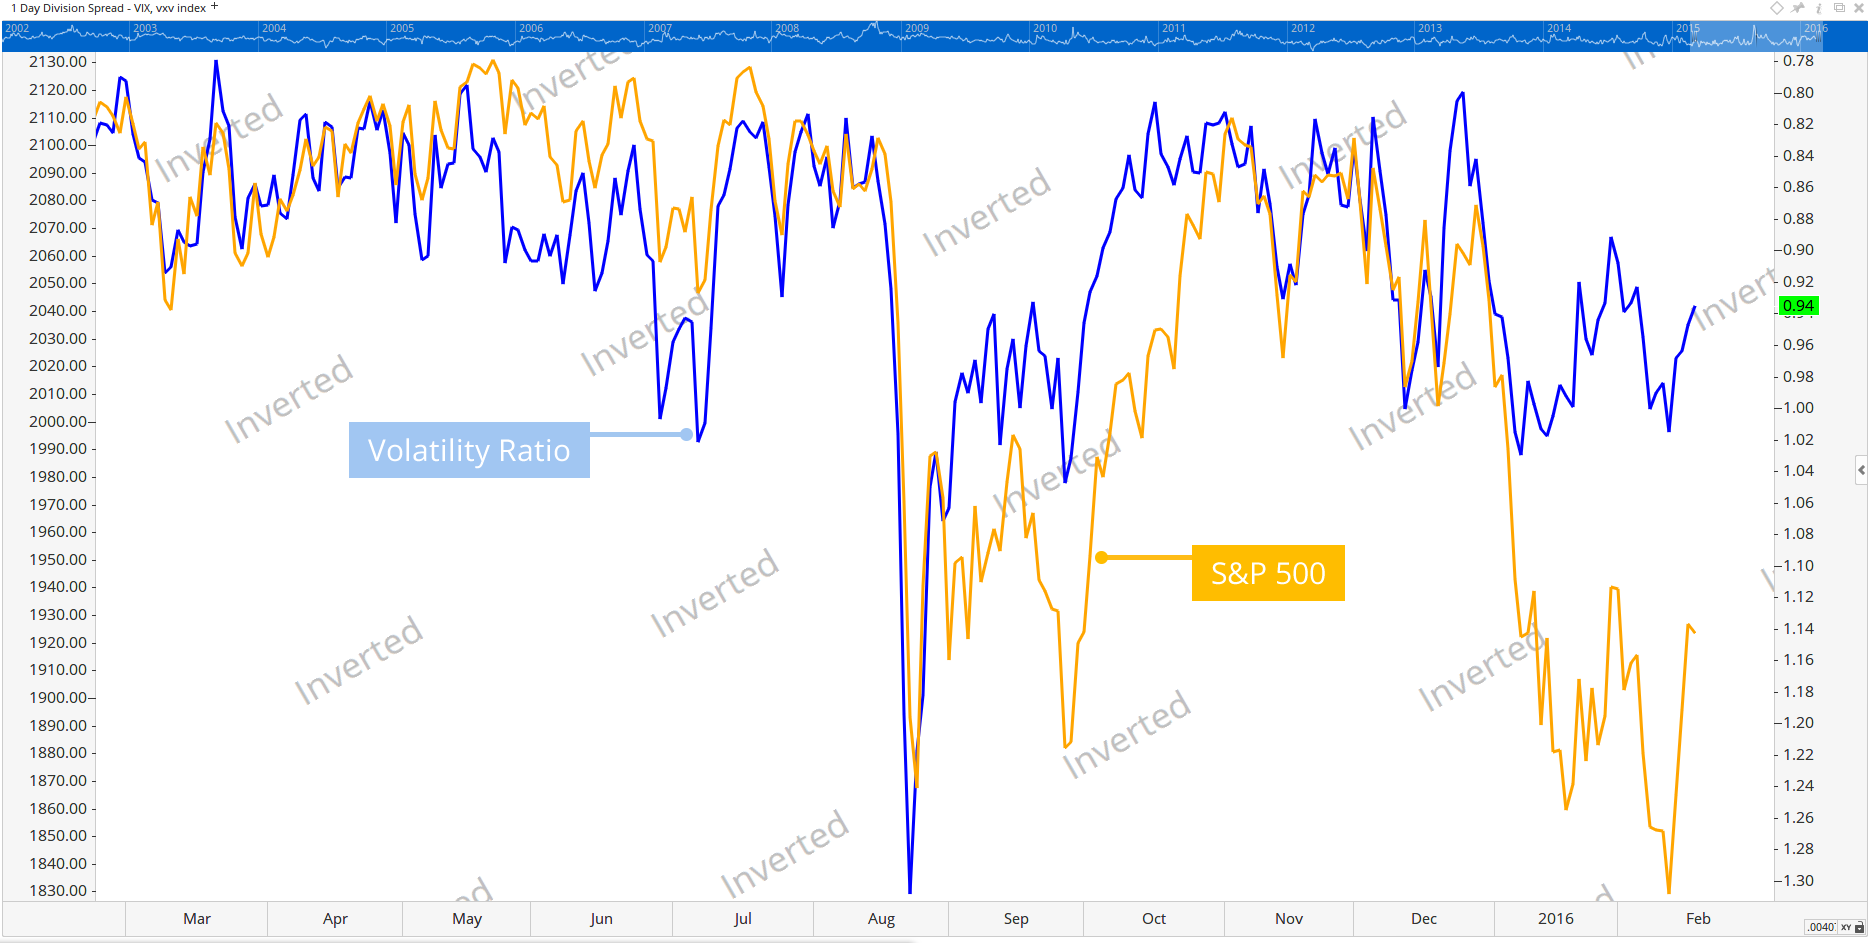 S&P 500 over its Volatility Ratio Inverted